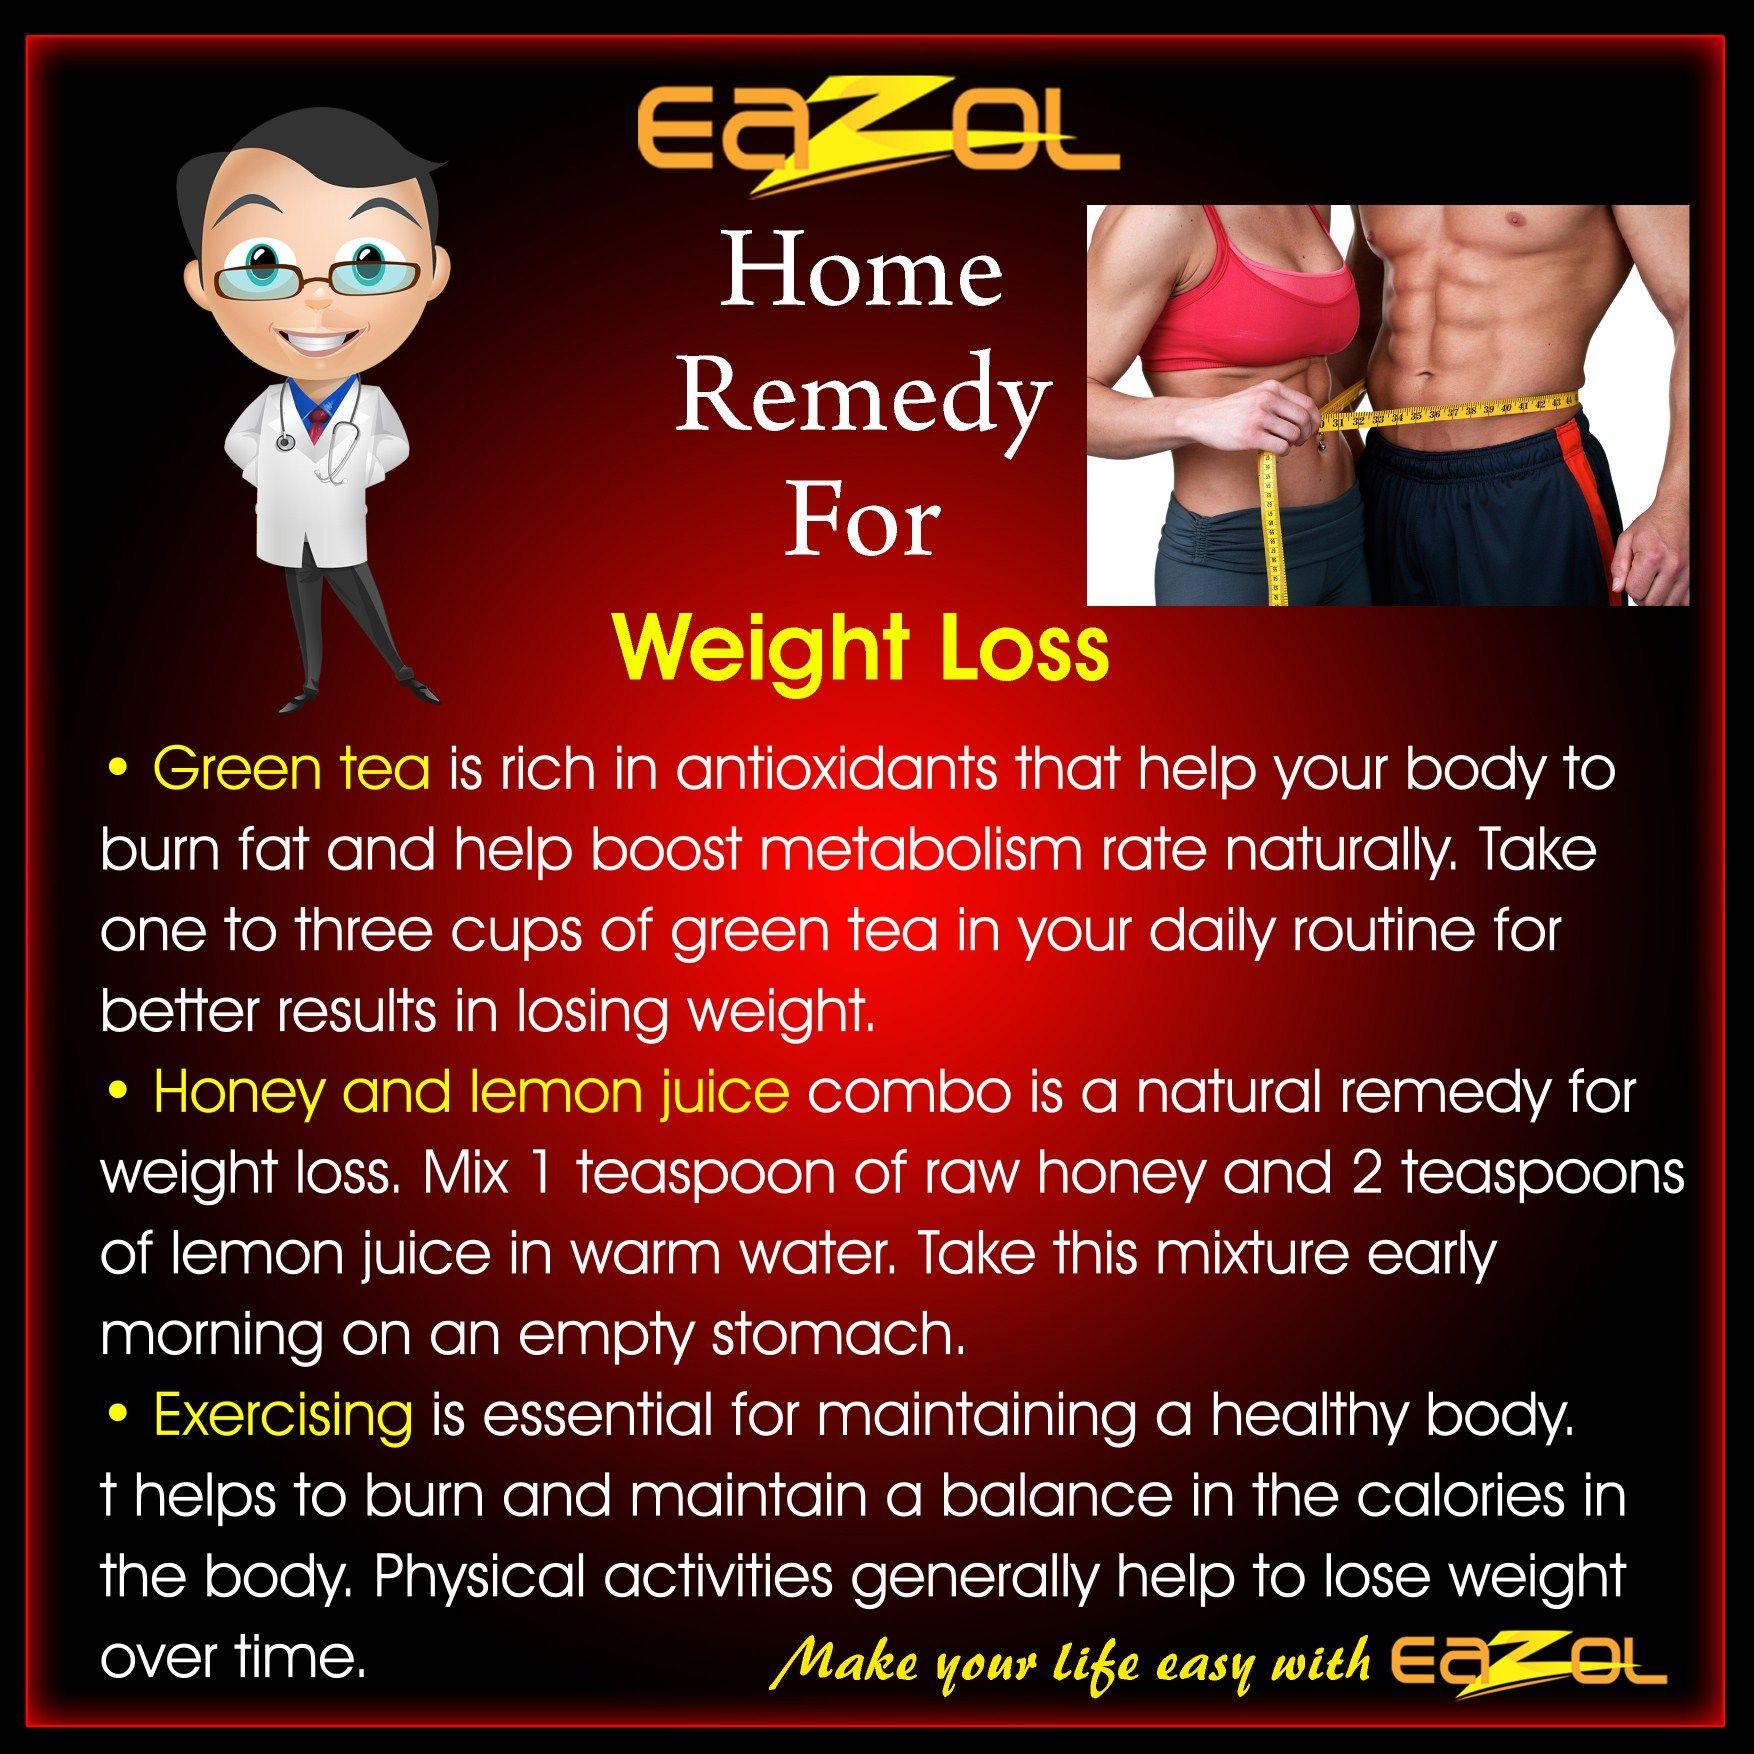 Do bath salts make you lose weight photo 4